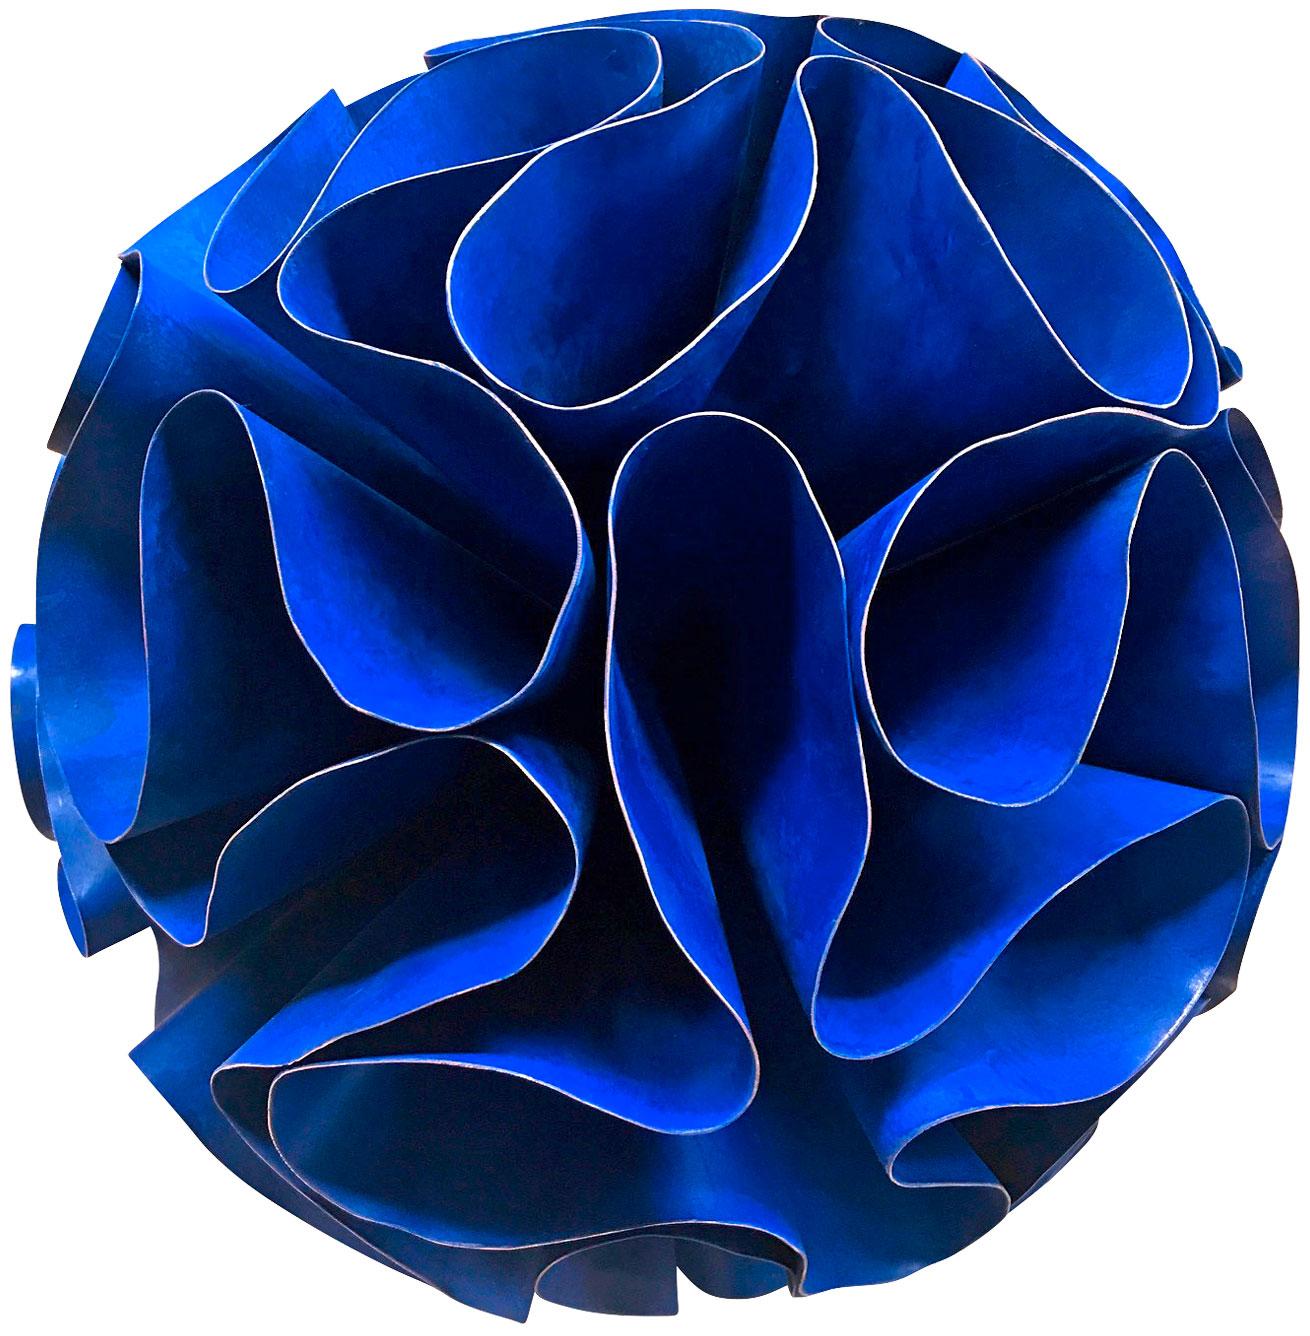 "Skulptur ""Seed - Deep Blue"" (2019) (Original / Unikat), Kupfer pigmentiert"